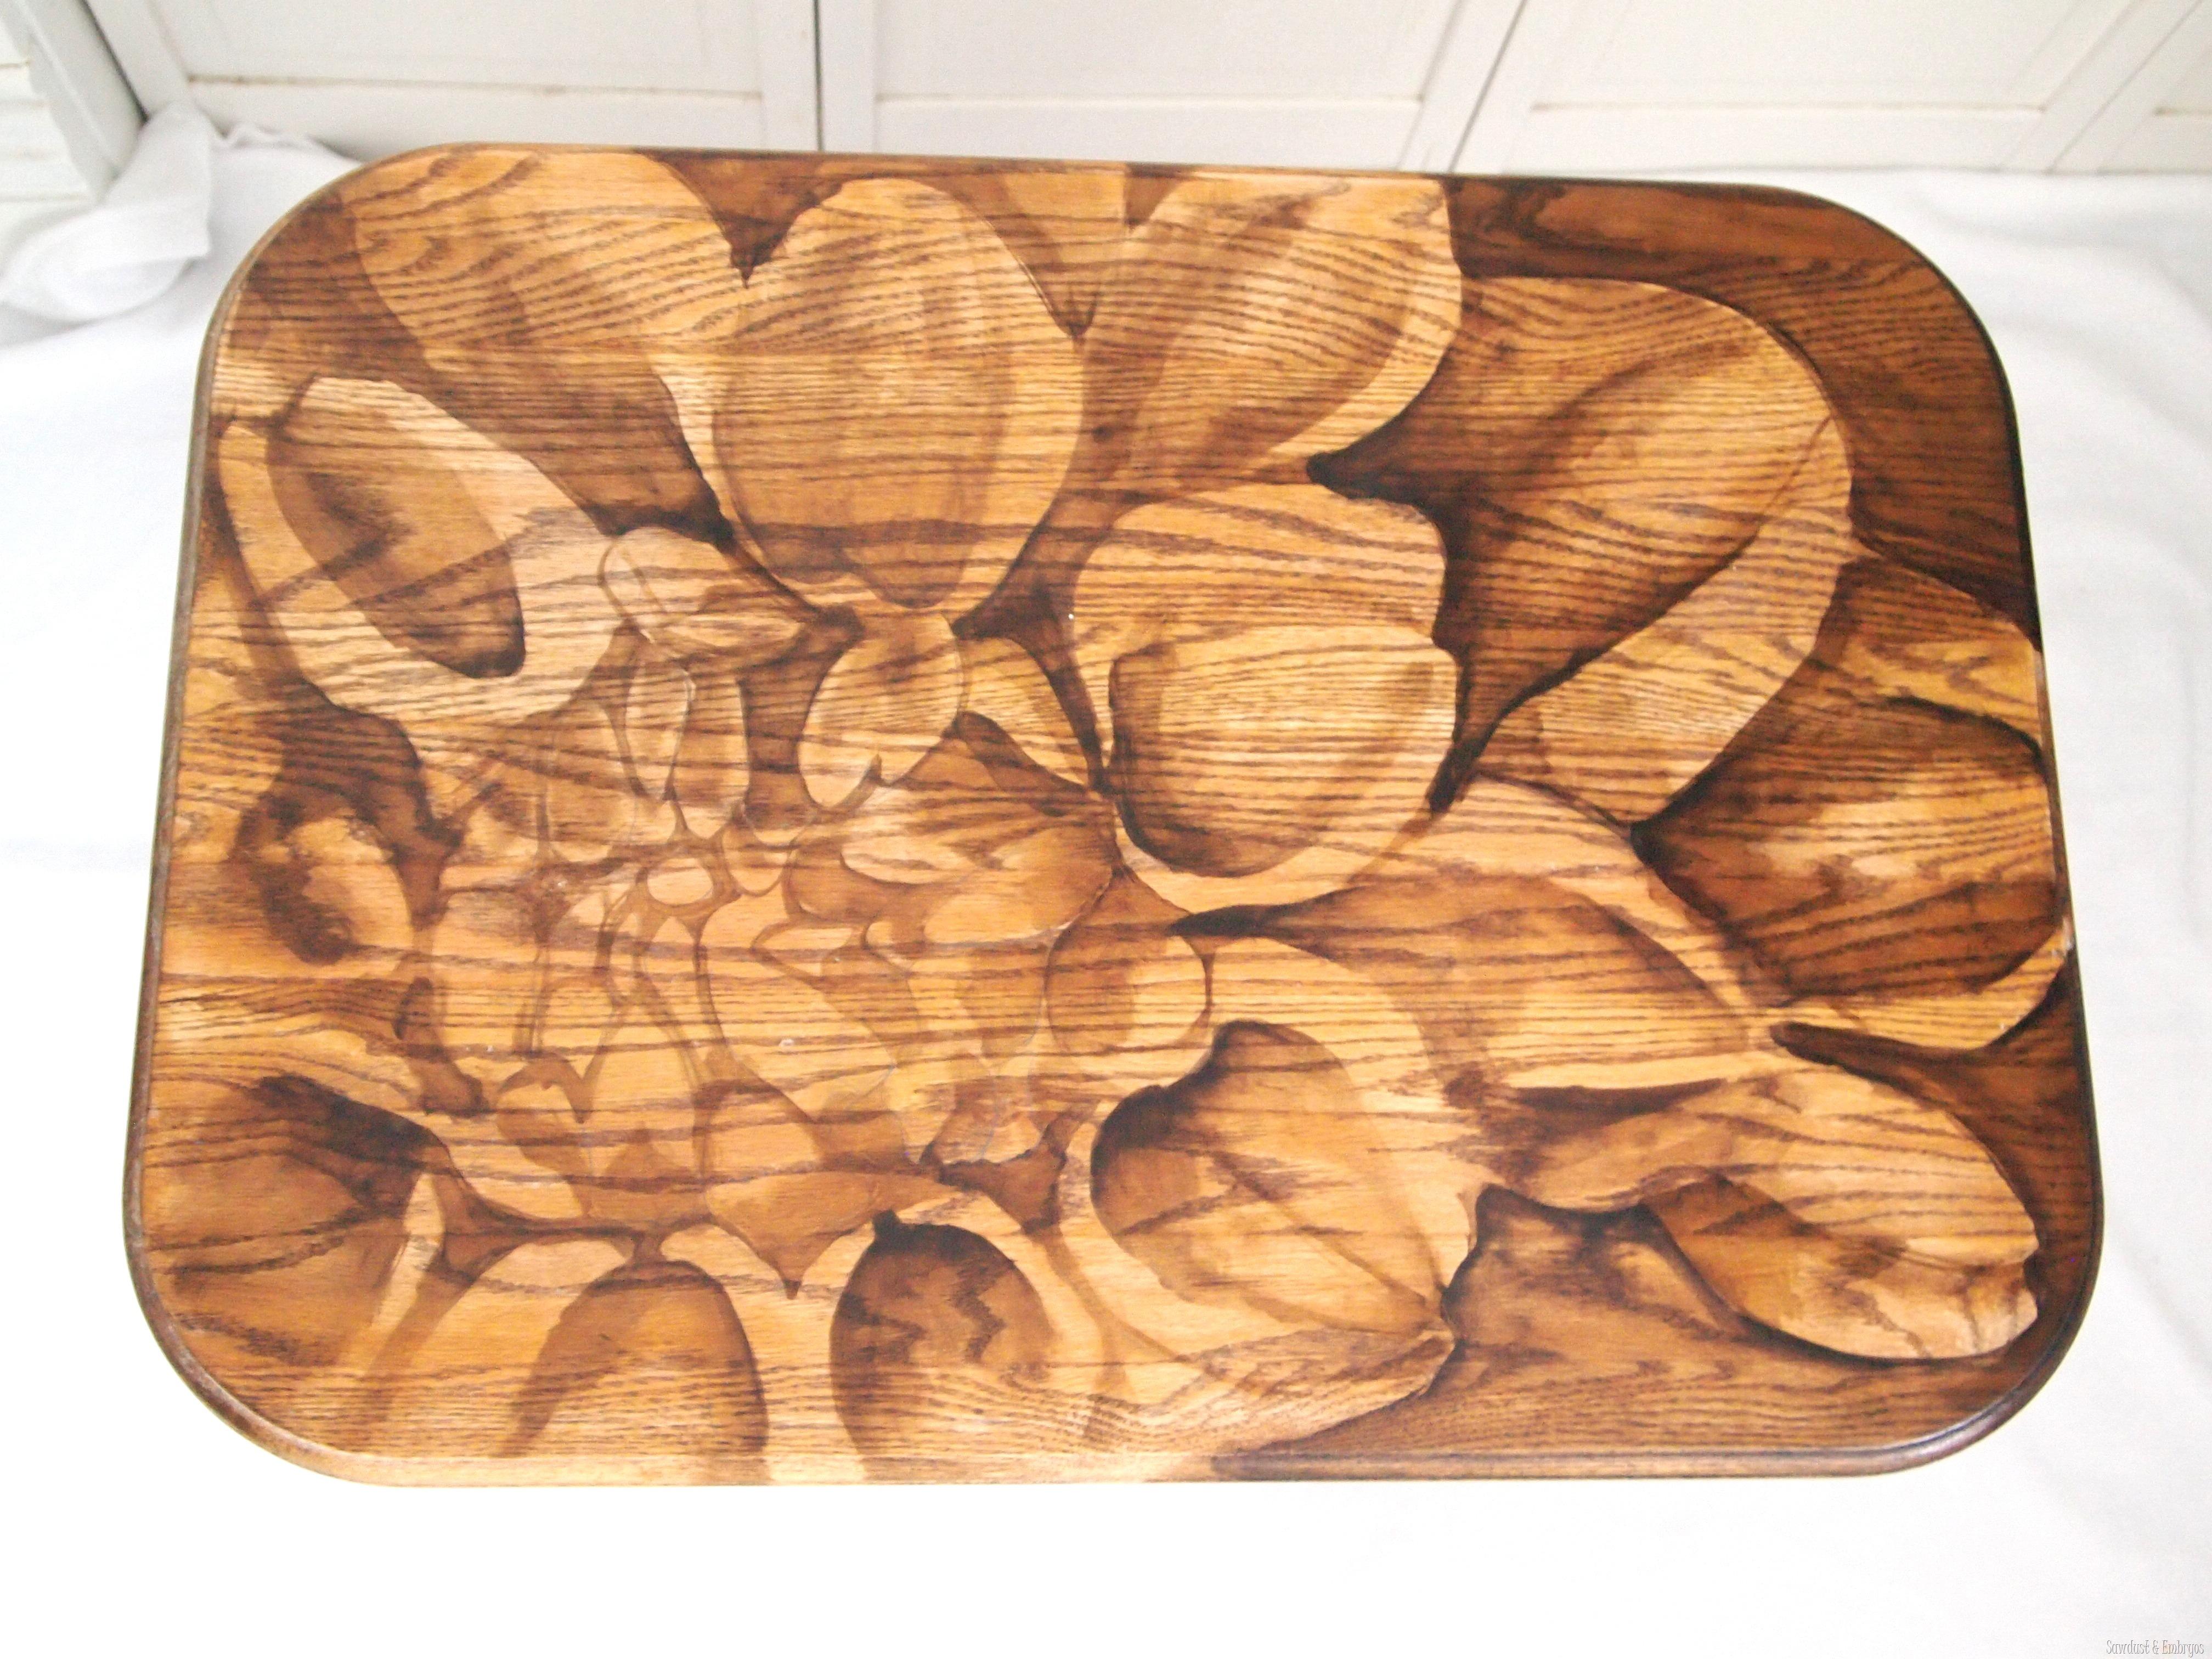 sawdust furniture. Artwork Using Wood Stain On Furniture Tops{Sawdust And Embryos} Sawdust O